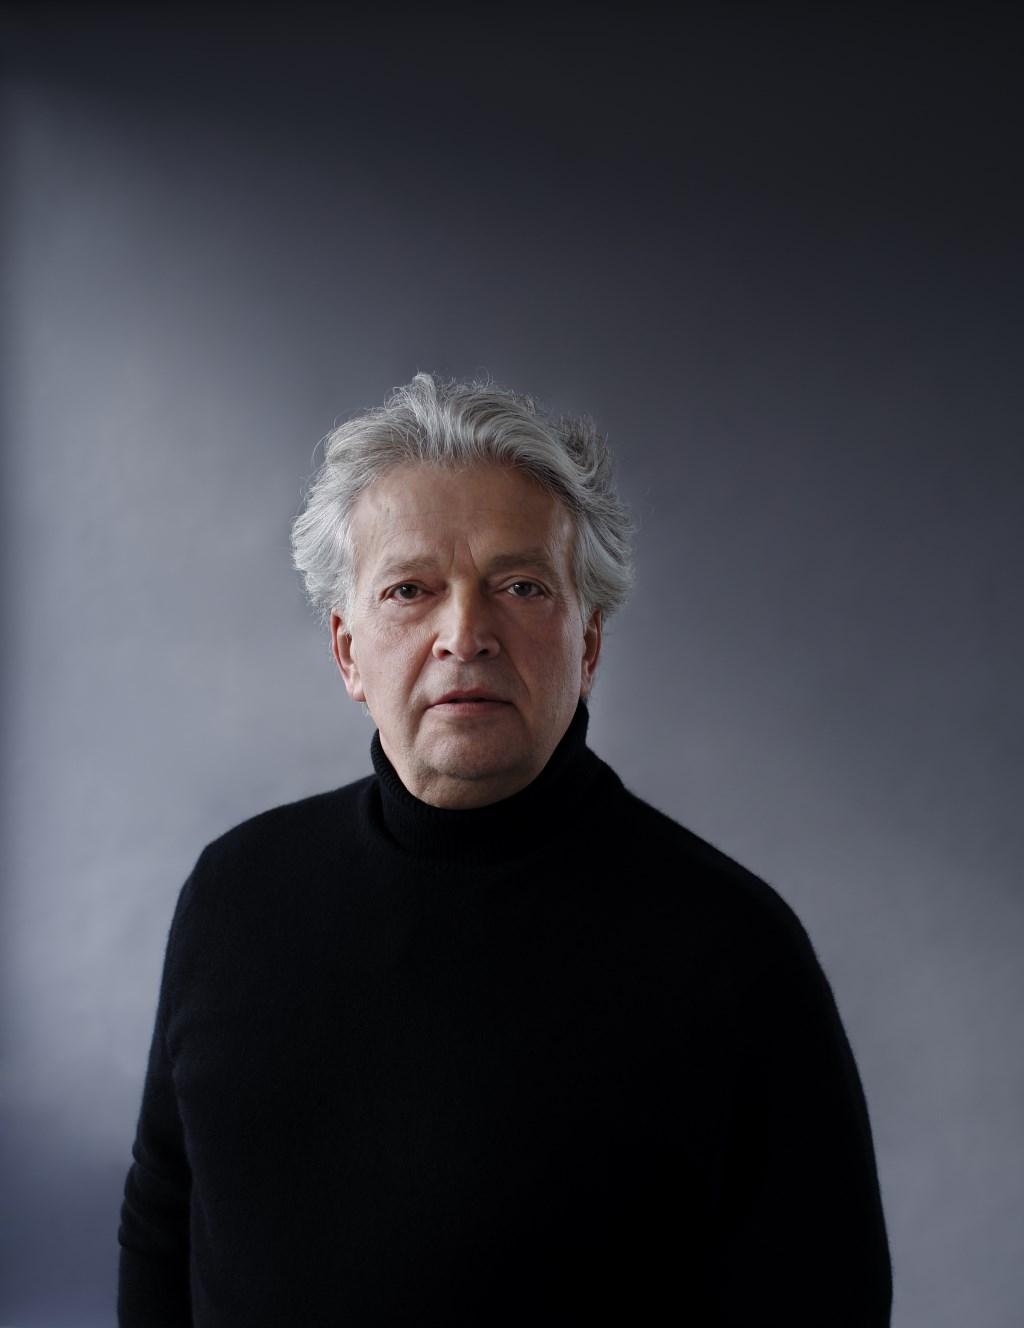 Claus Peter Flor, Berlin, 2014, copyright www.peterrigaud.com